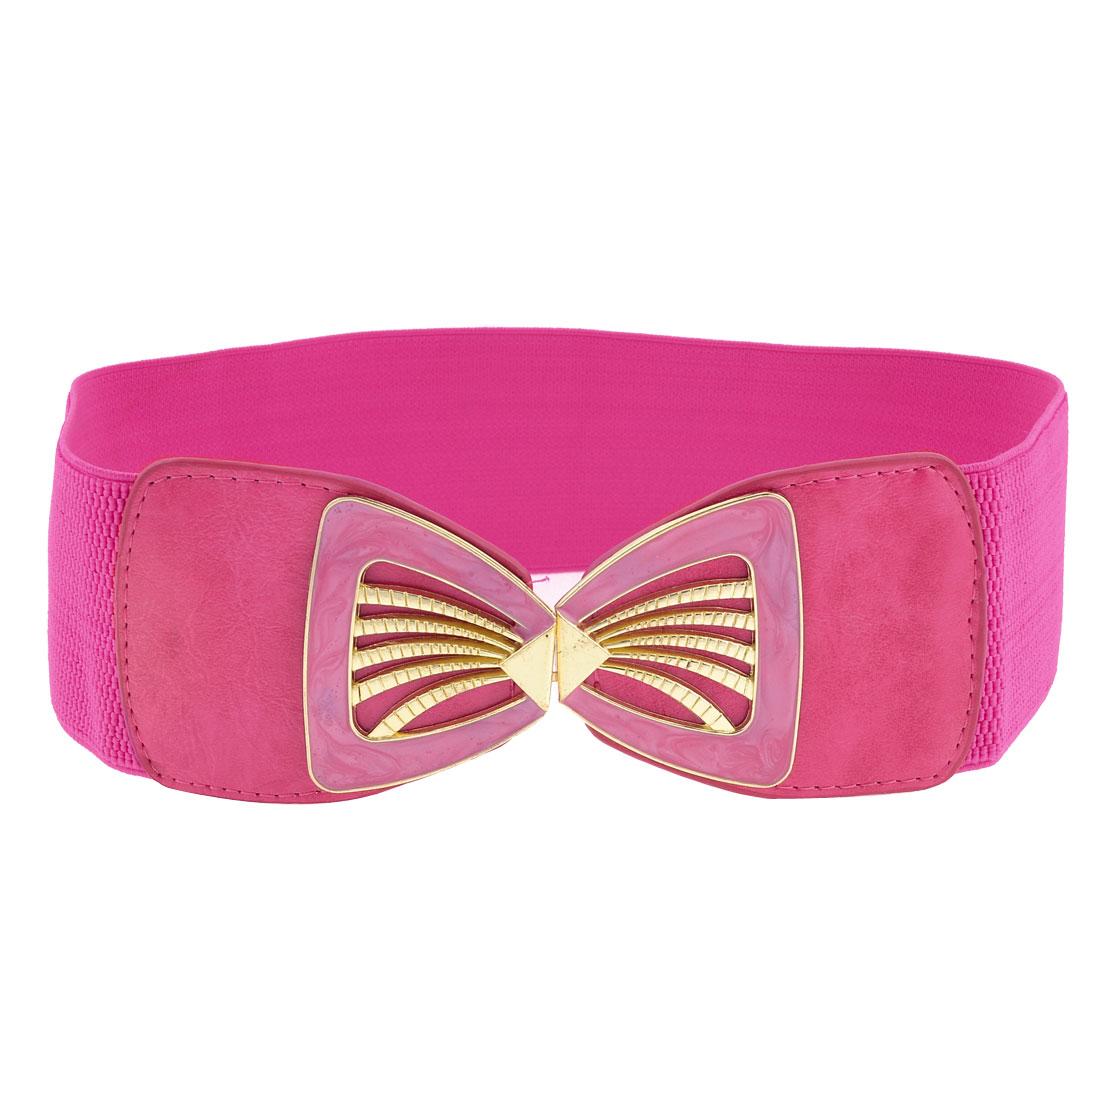 Fuchsia Faux Leather Elastic Band Seashell Chape Buckle Belt for Girls